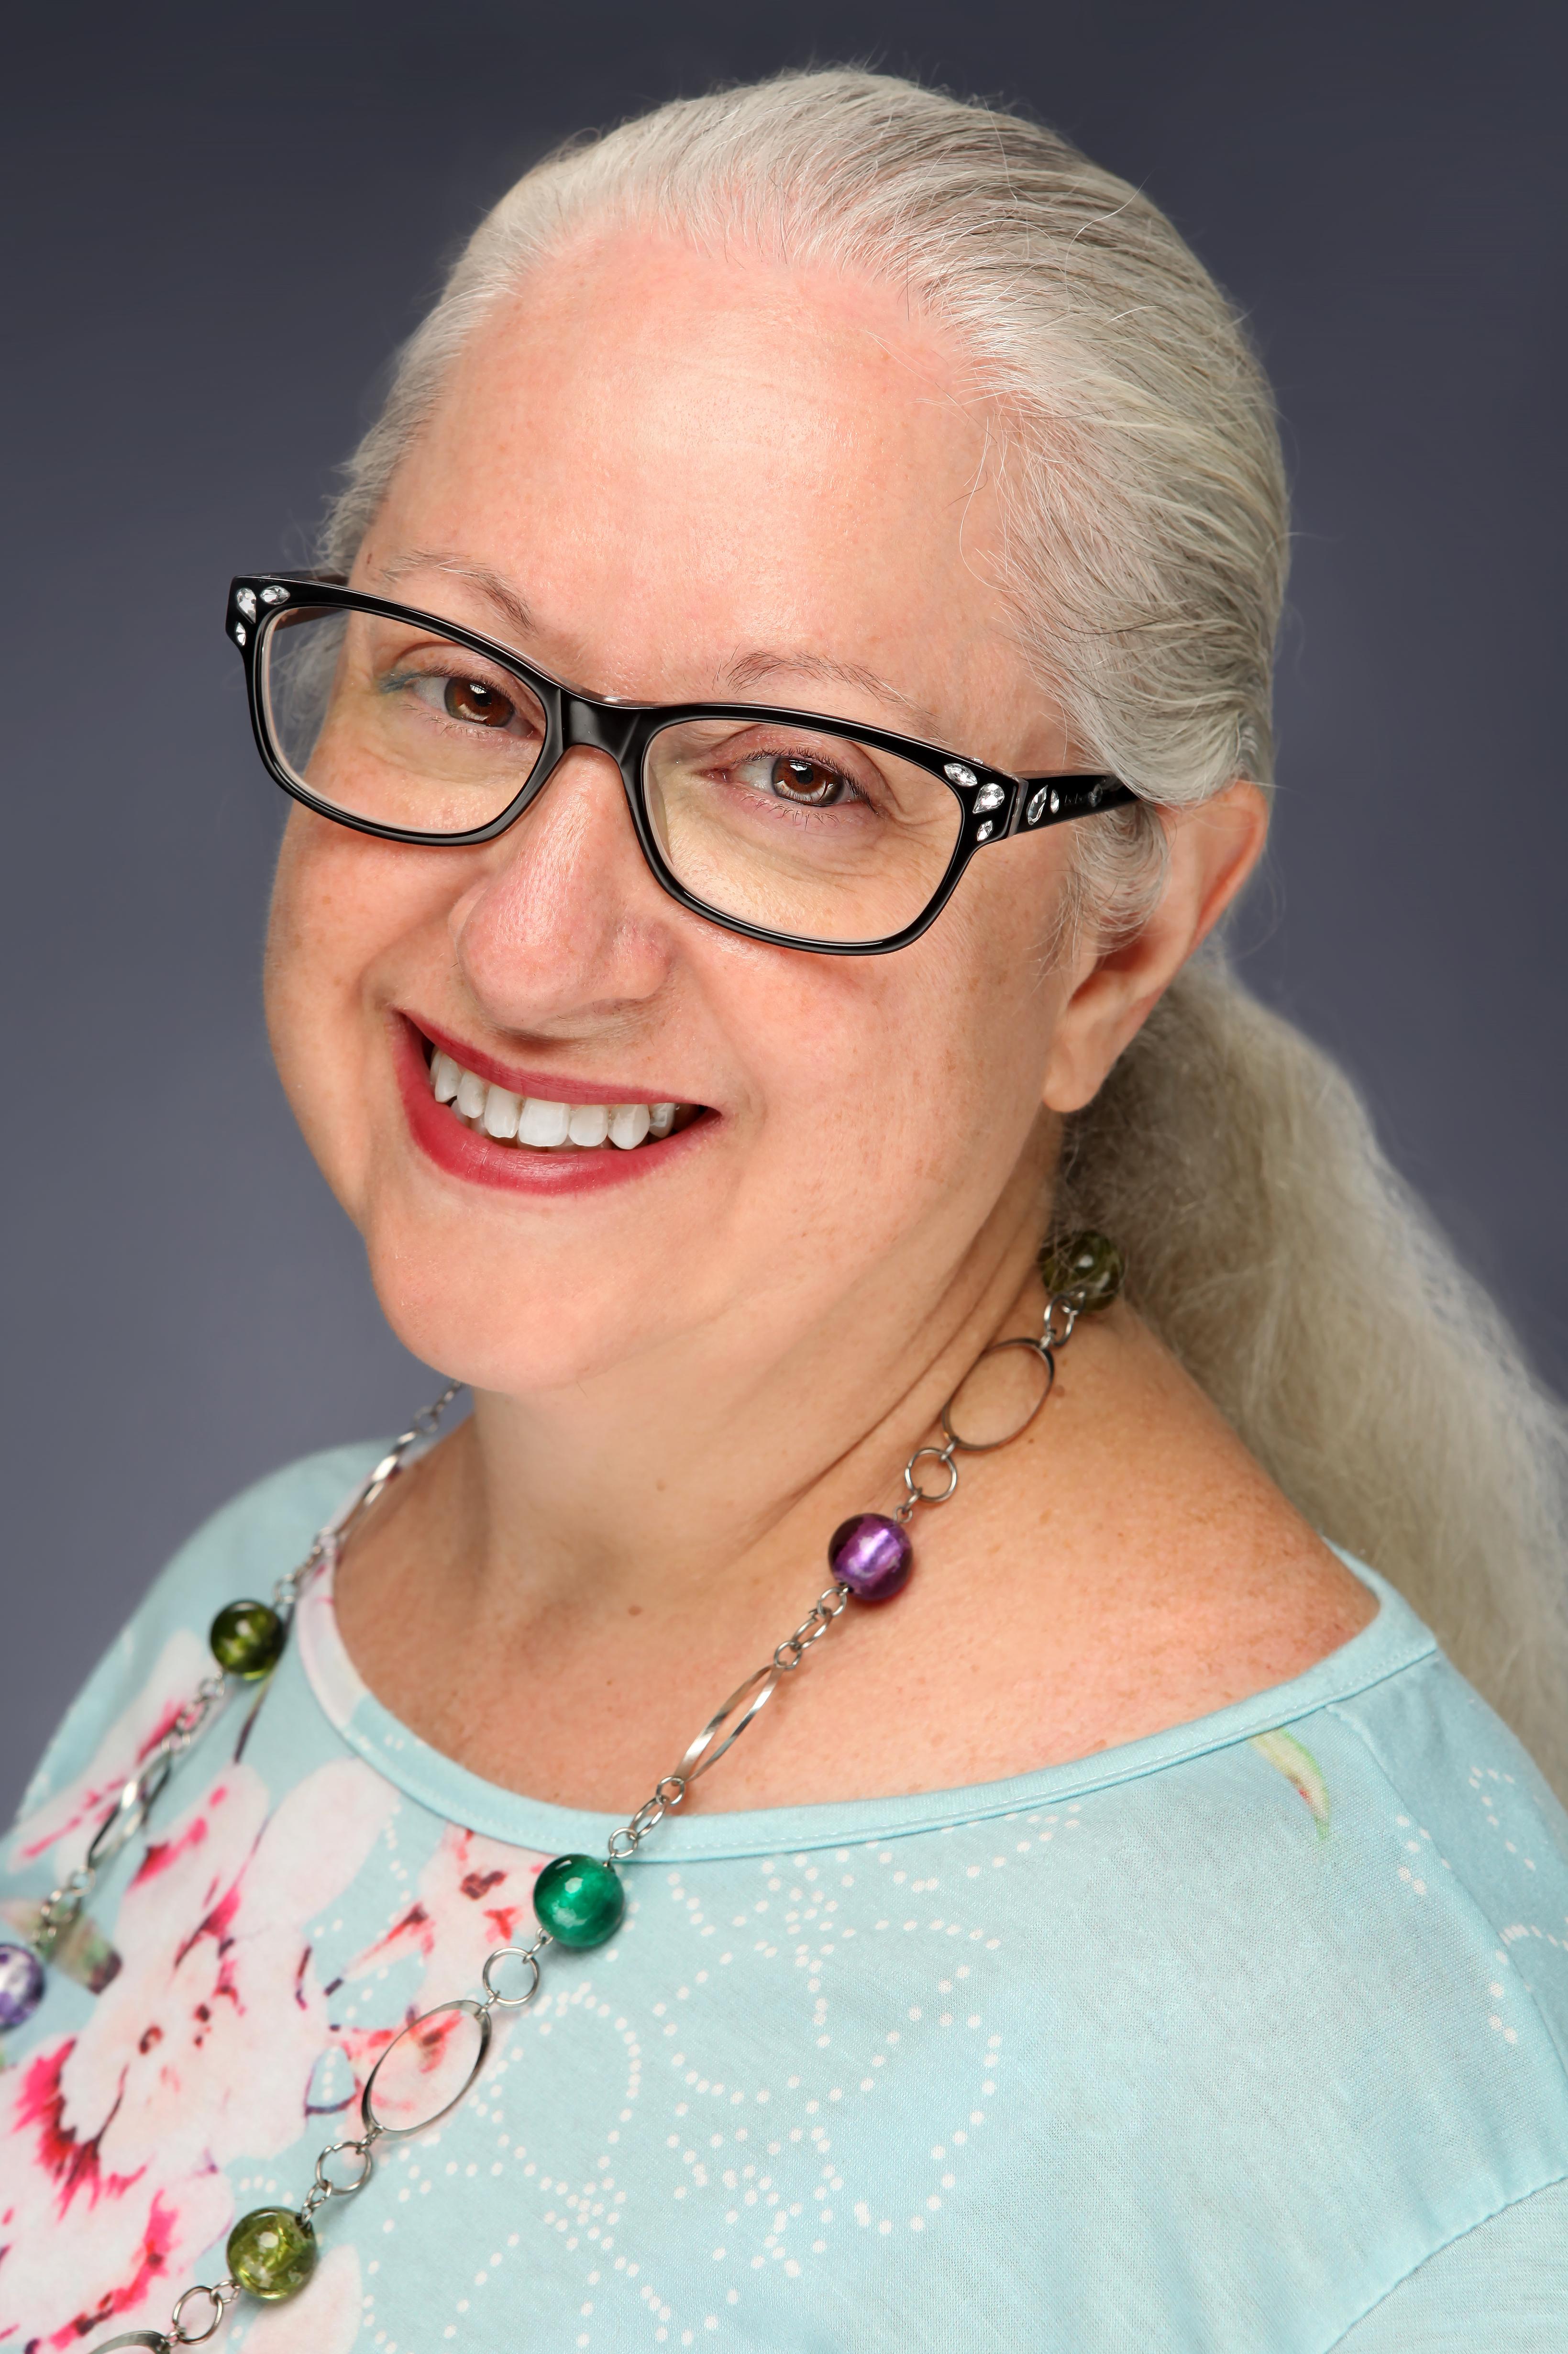 Melissa Esquibel